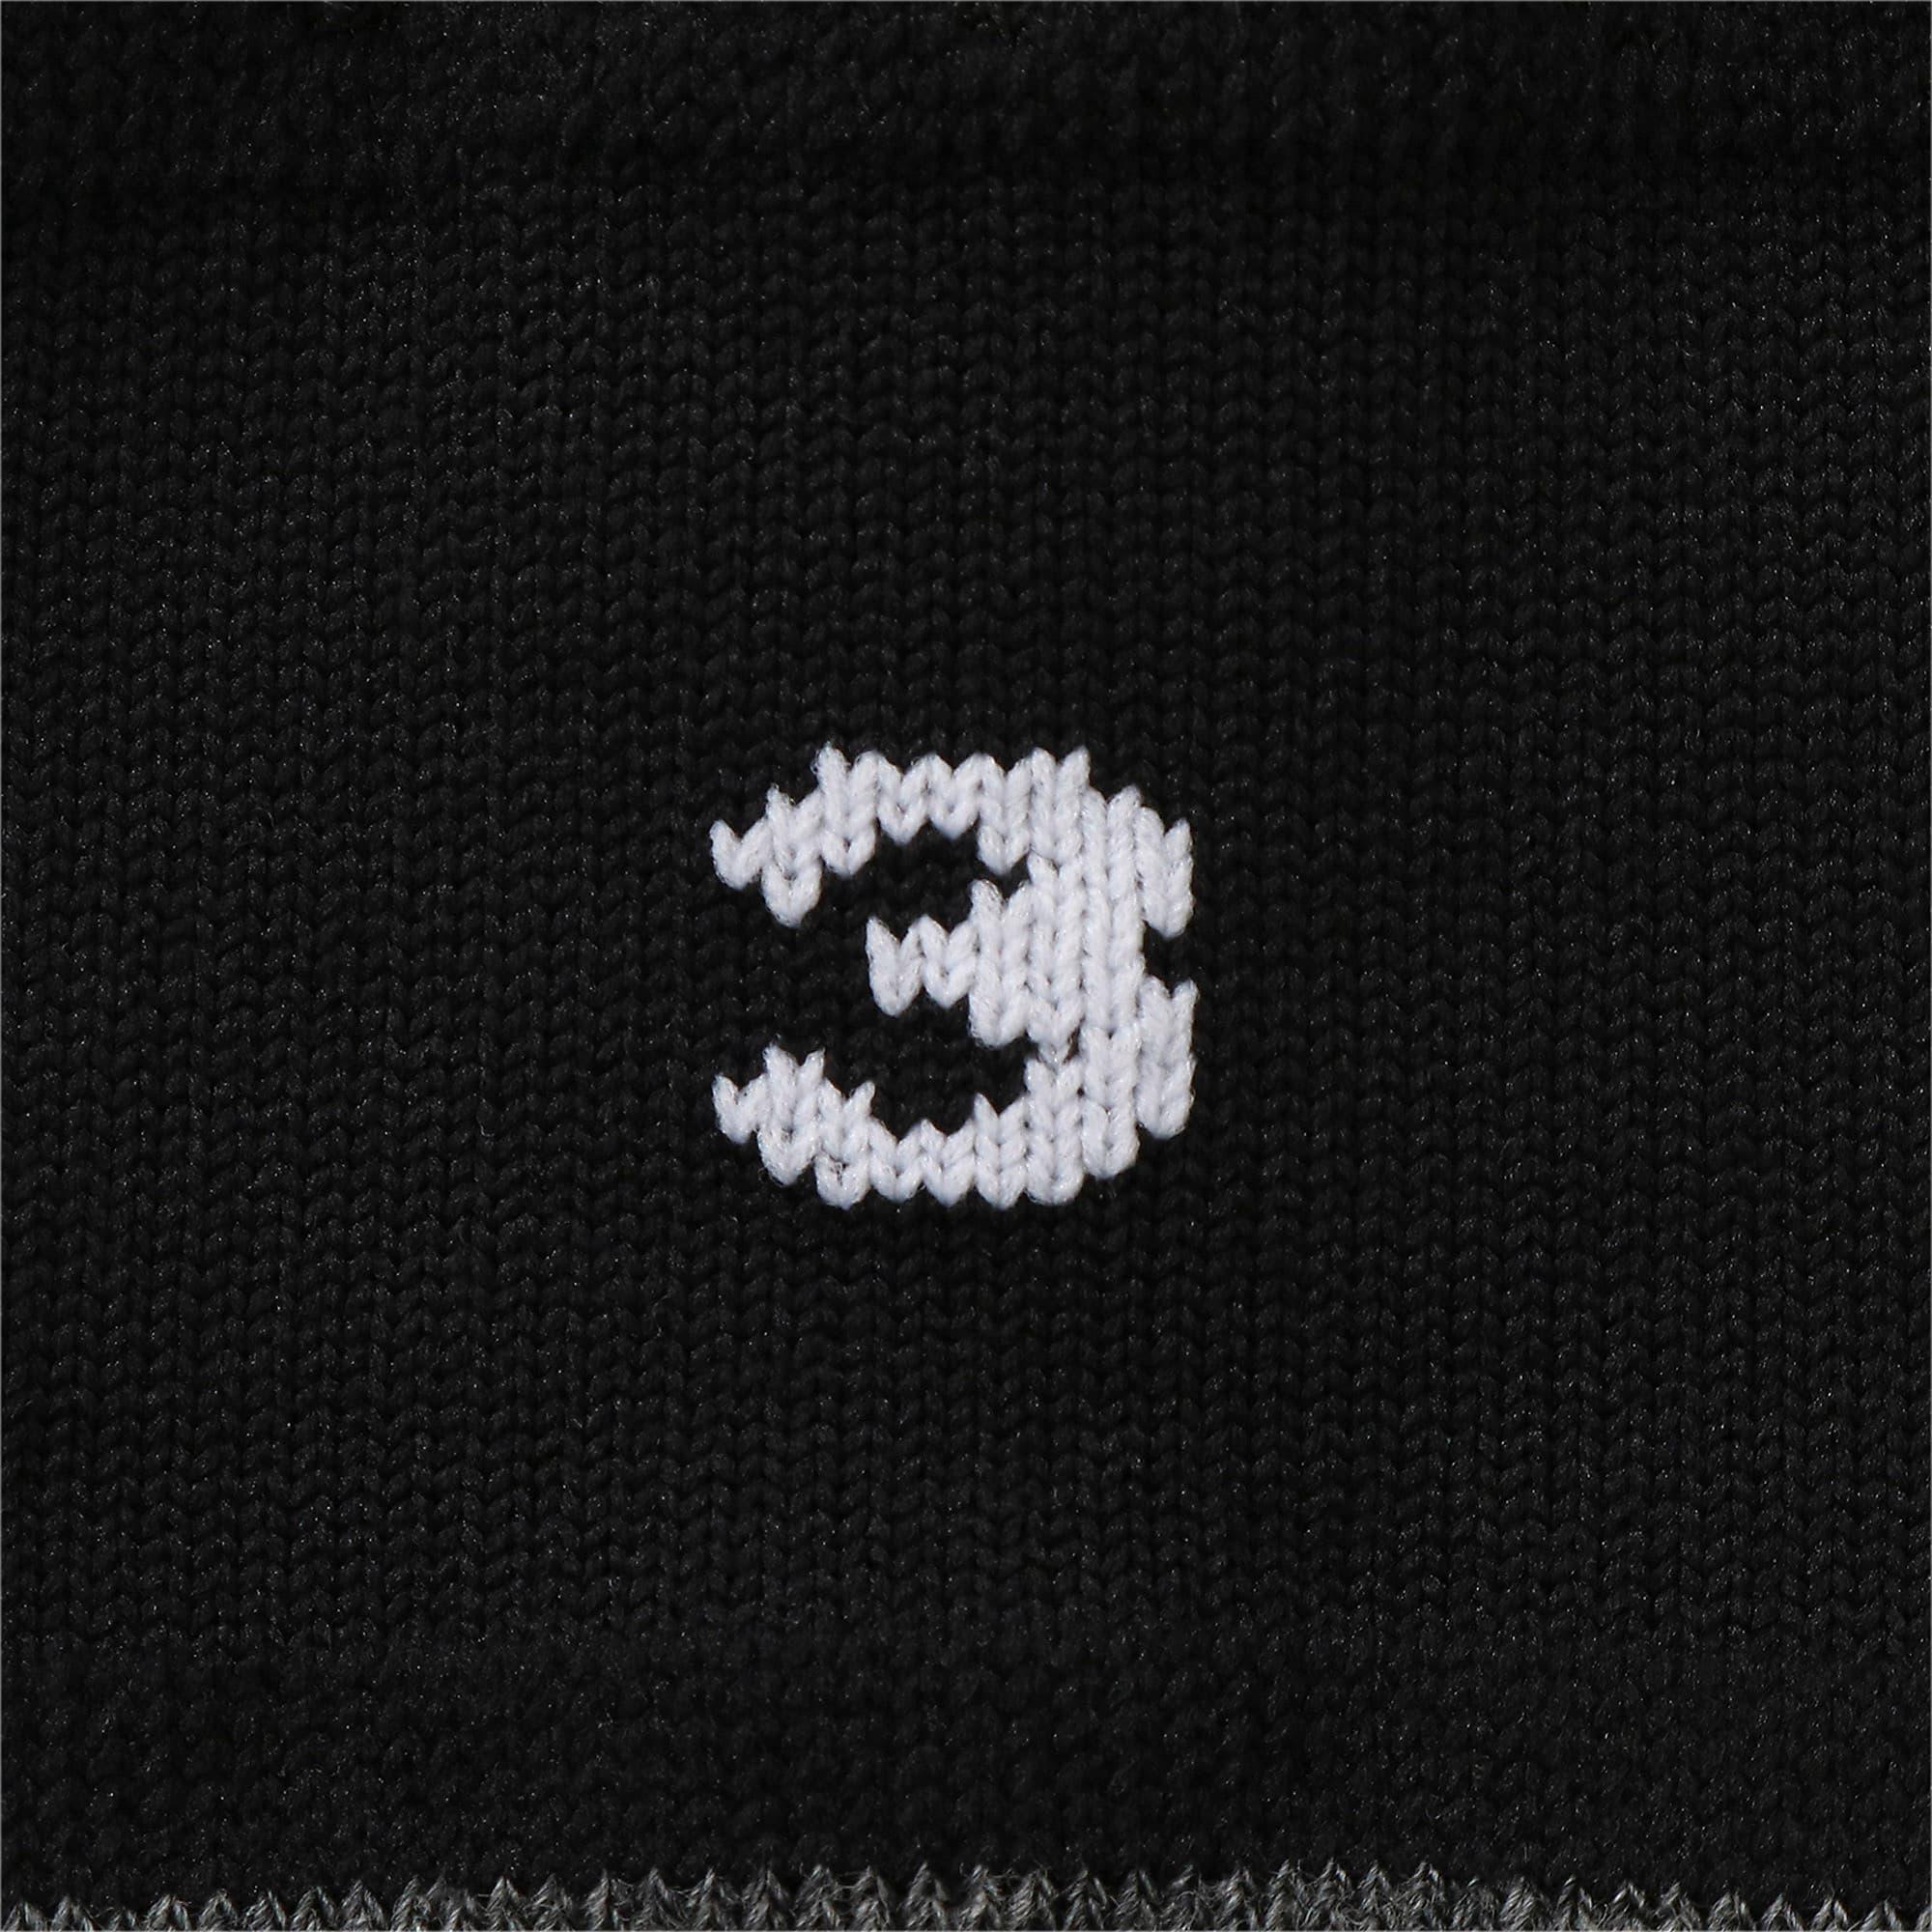 Thumbnail 8 of マンチェスター・シティ MCFC スパイラル ストッキング, Puma Black-Georgia Peach, medium-JPN